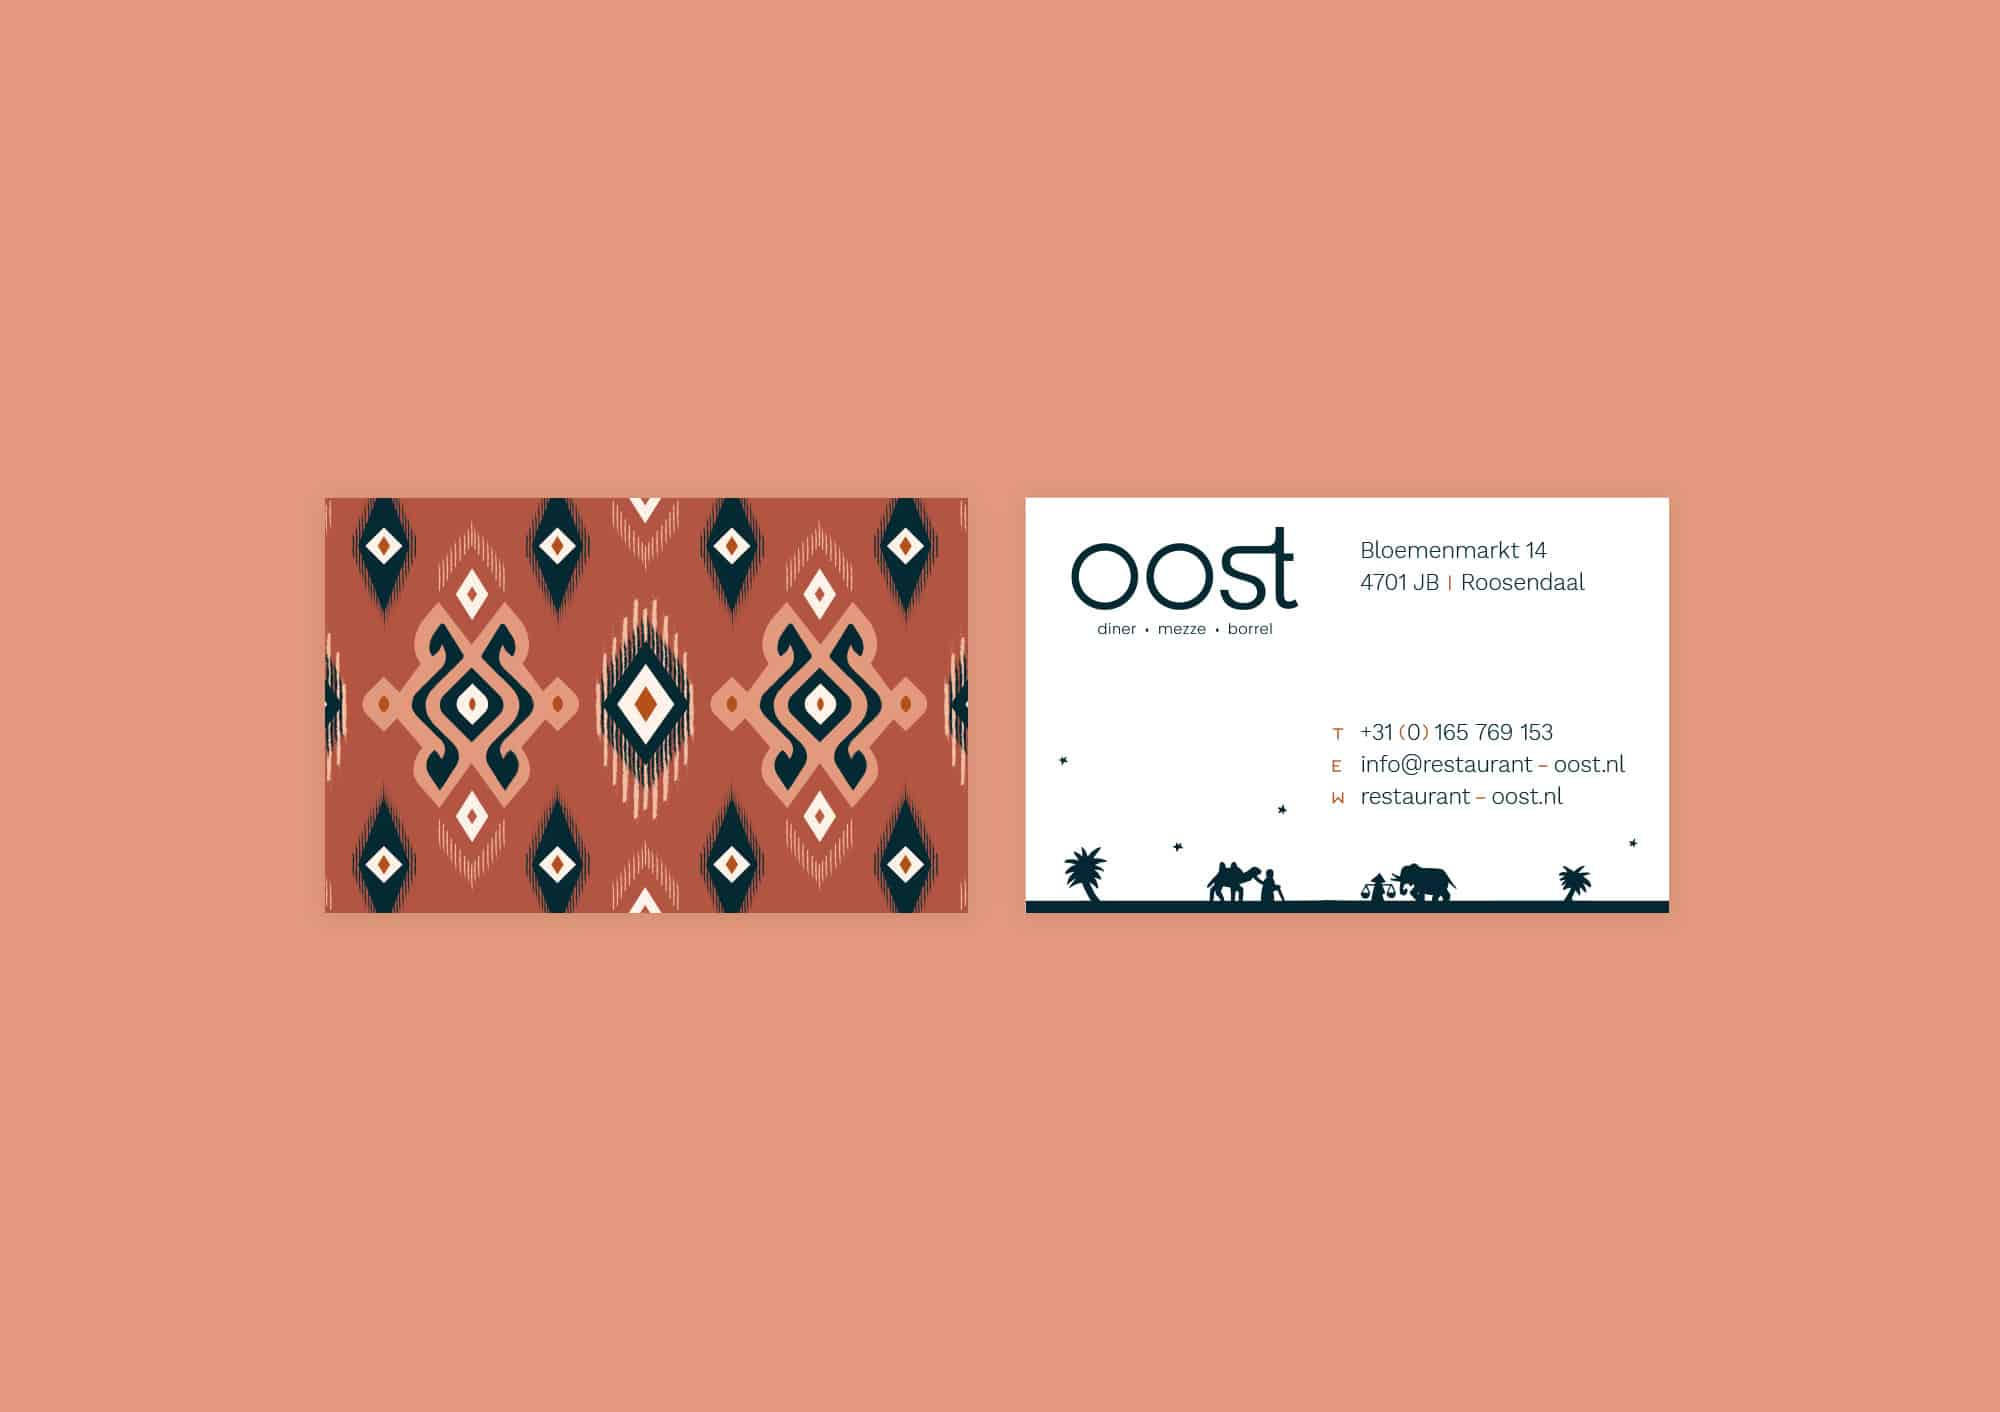 Design business cards for Restaurant Oost